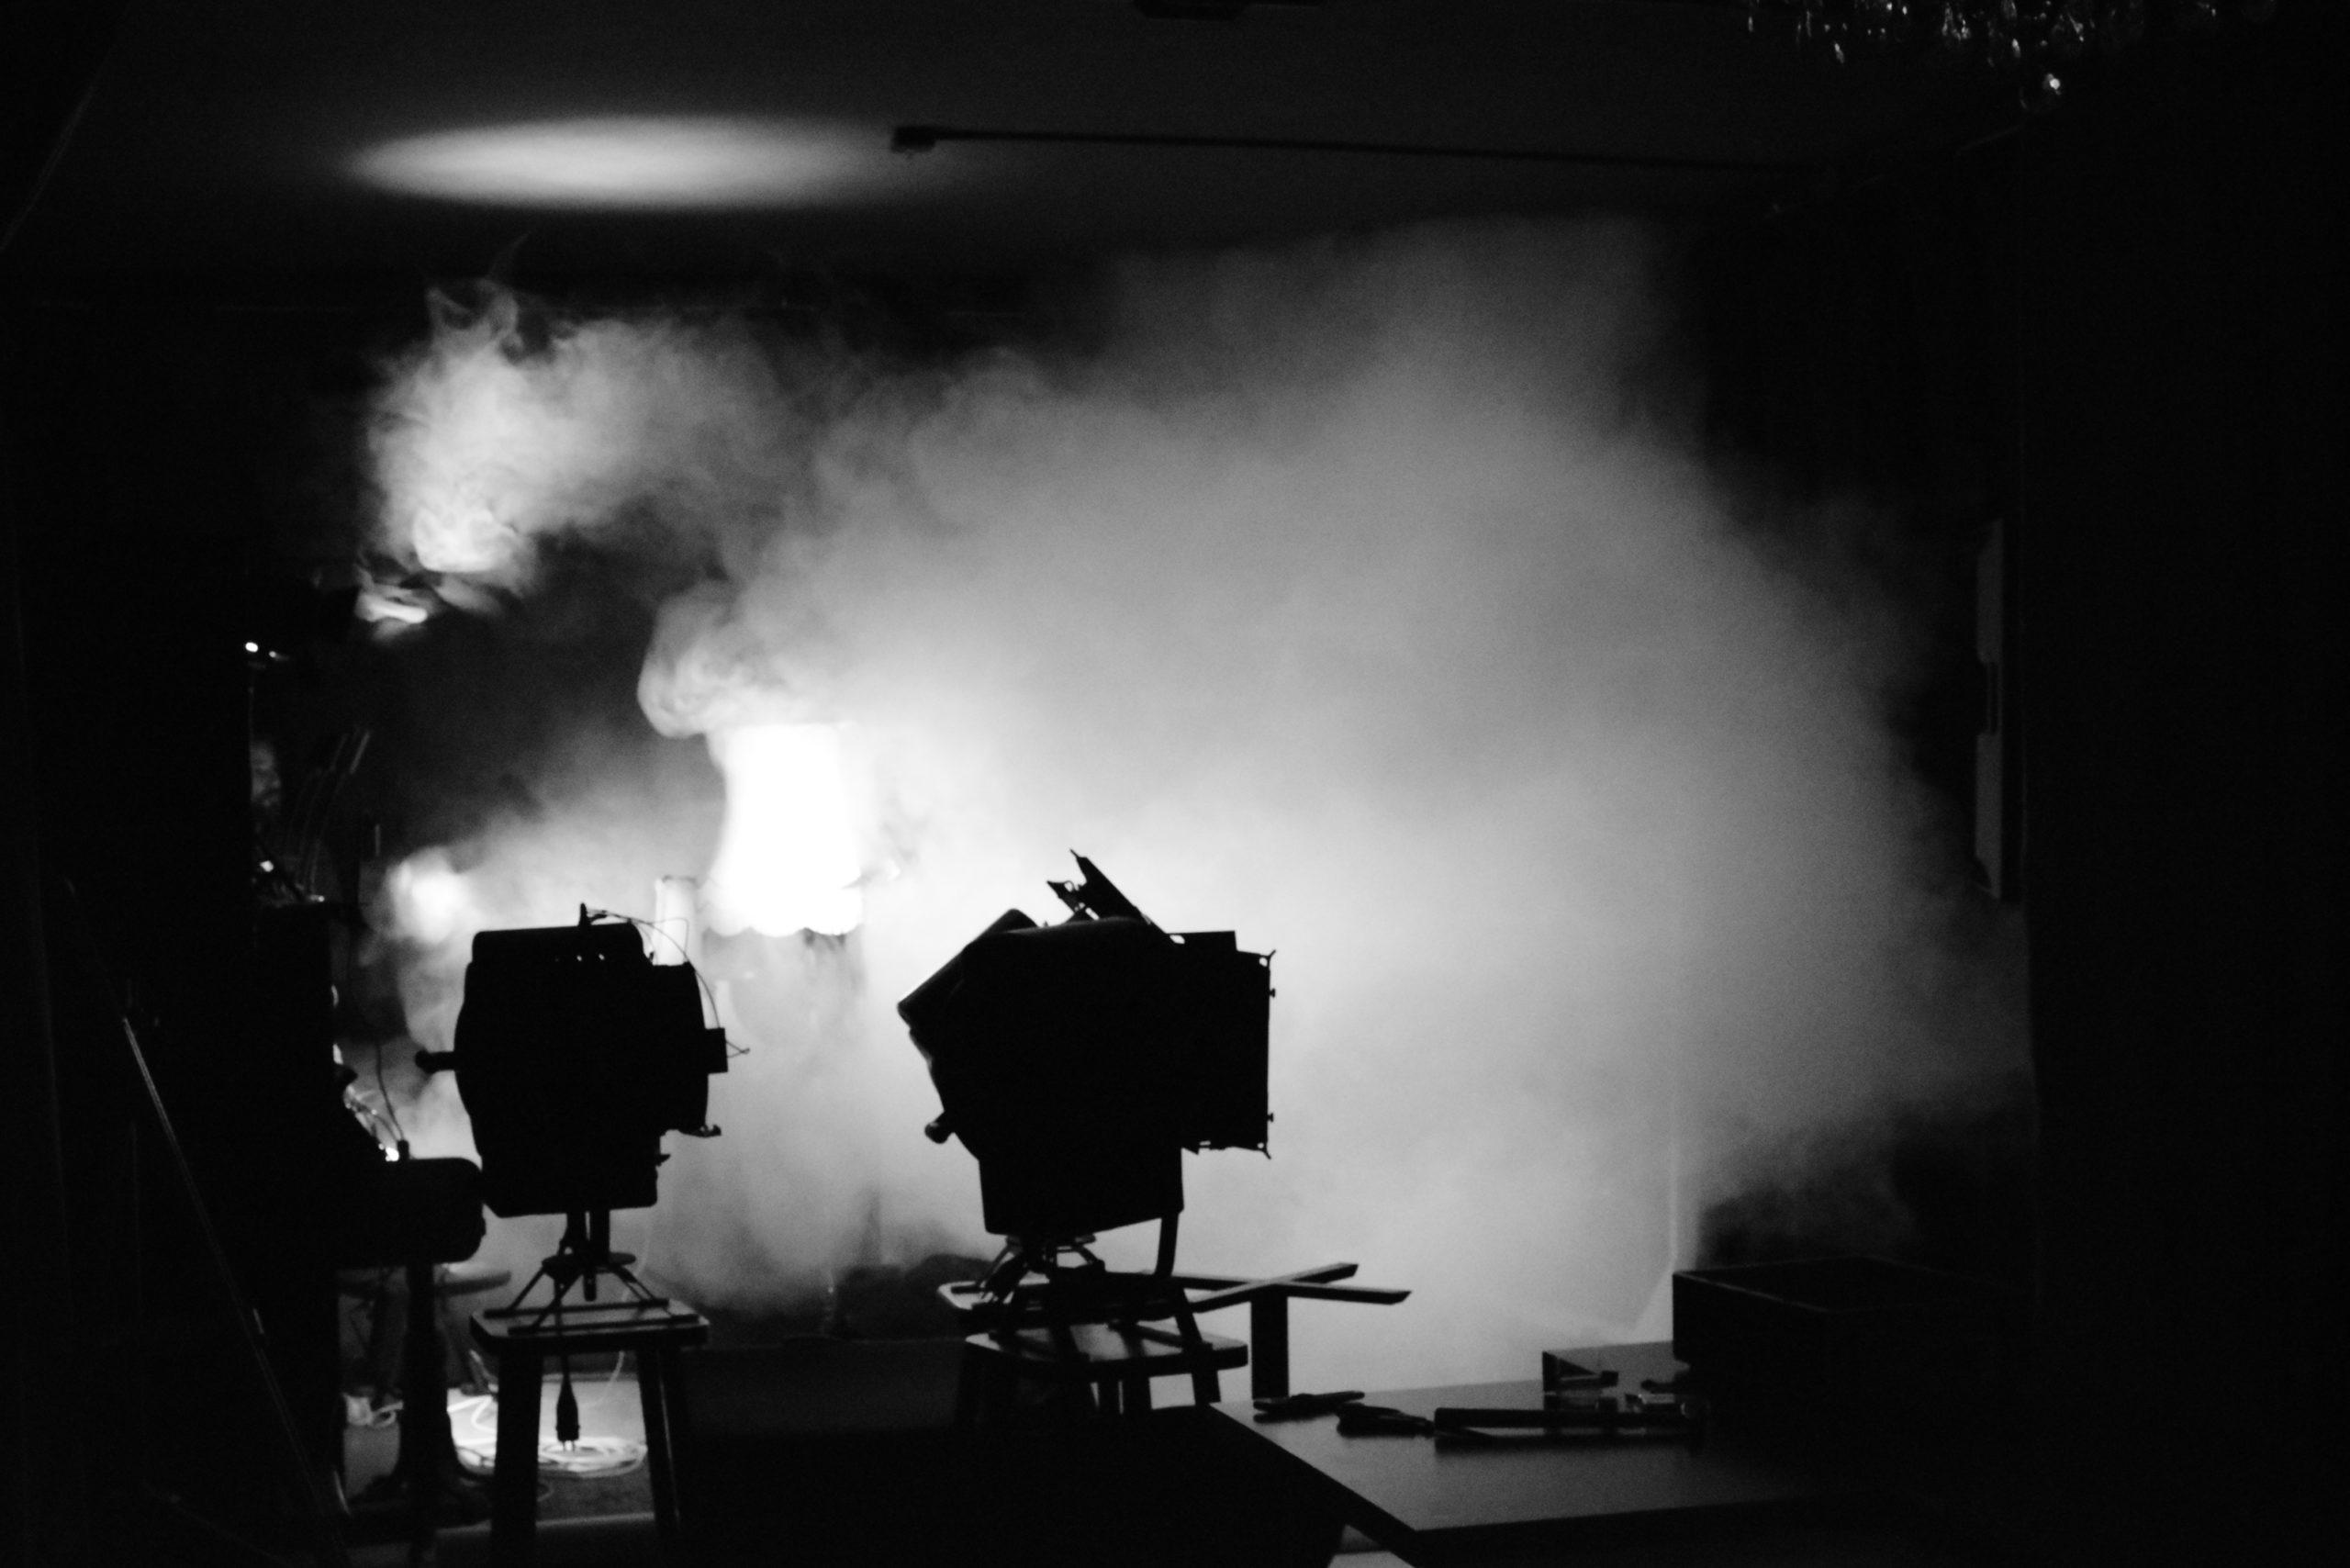 KNH-Darkroom #7